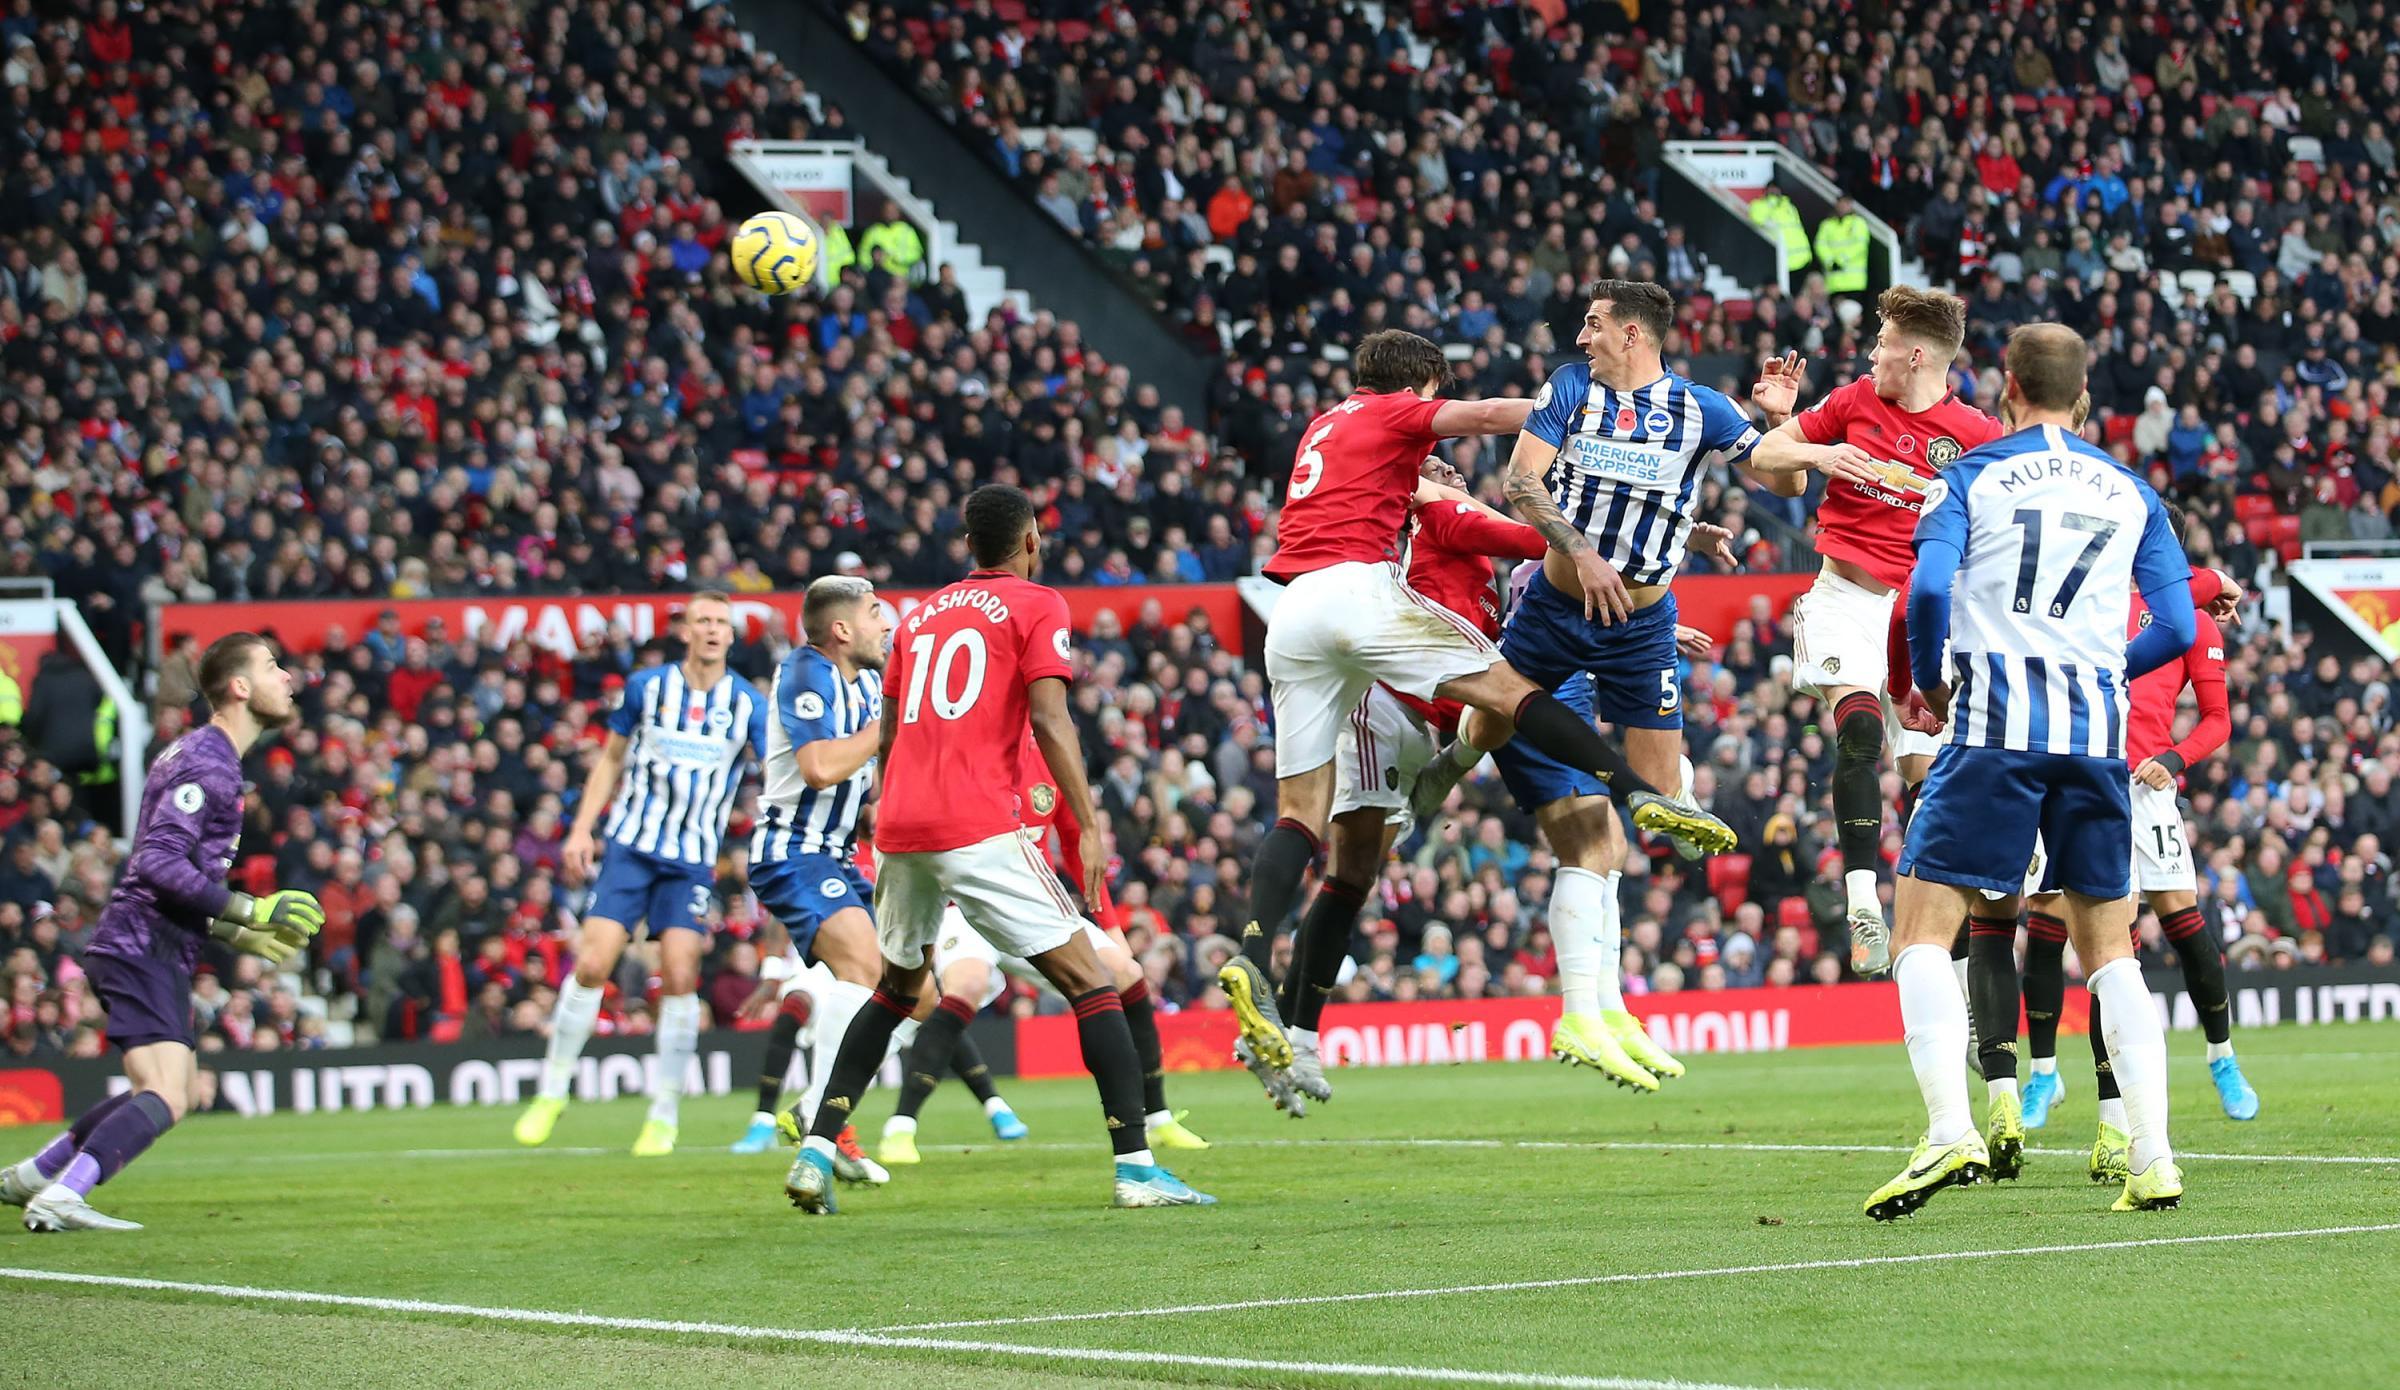 Follow Albion at Old Trafford against Manchester United:   Rashford makes it 3-1